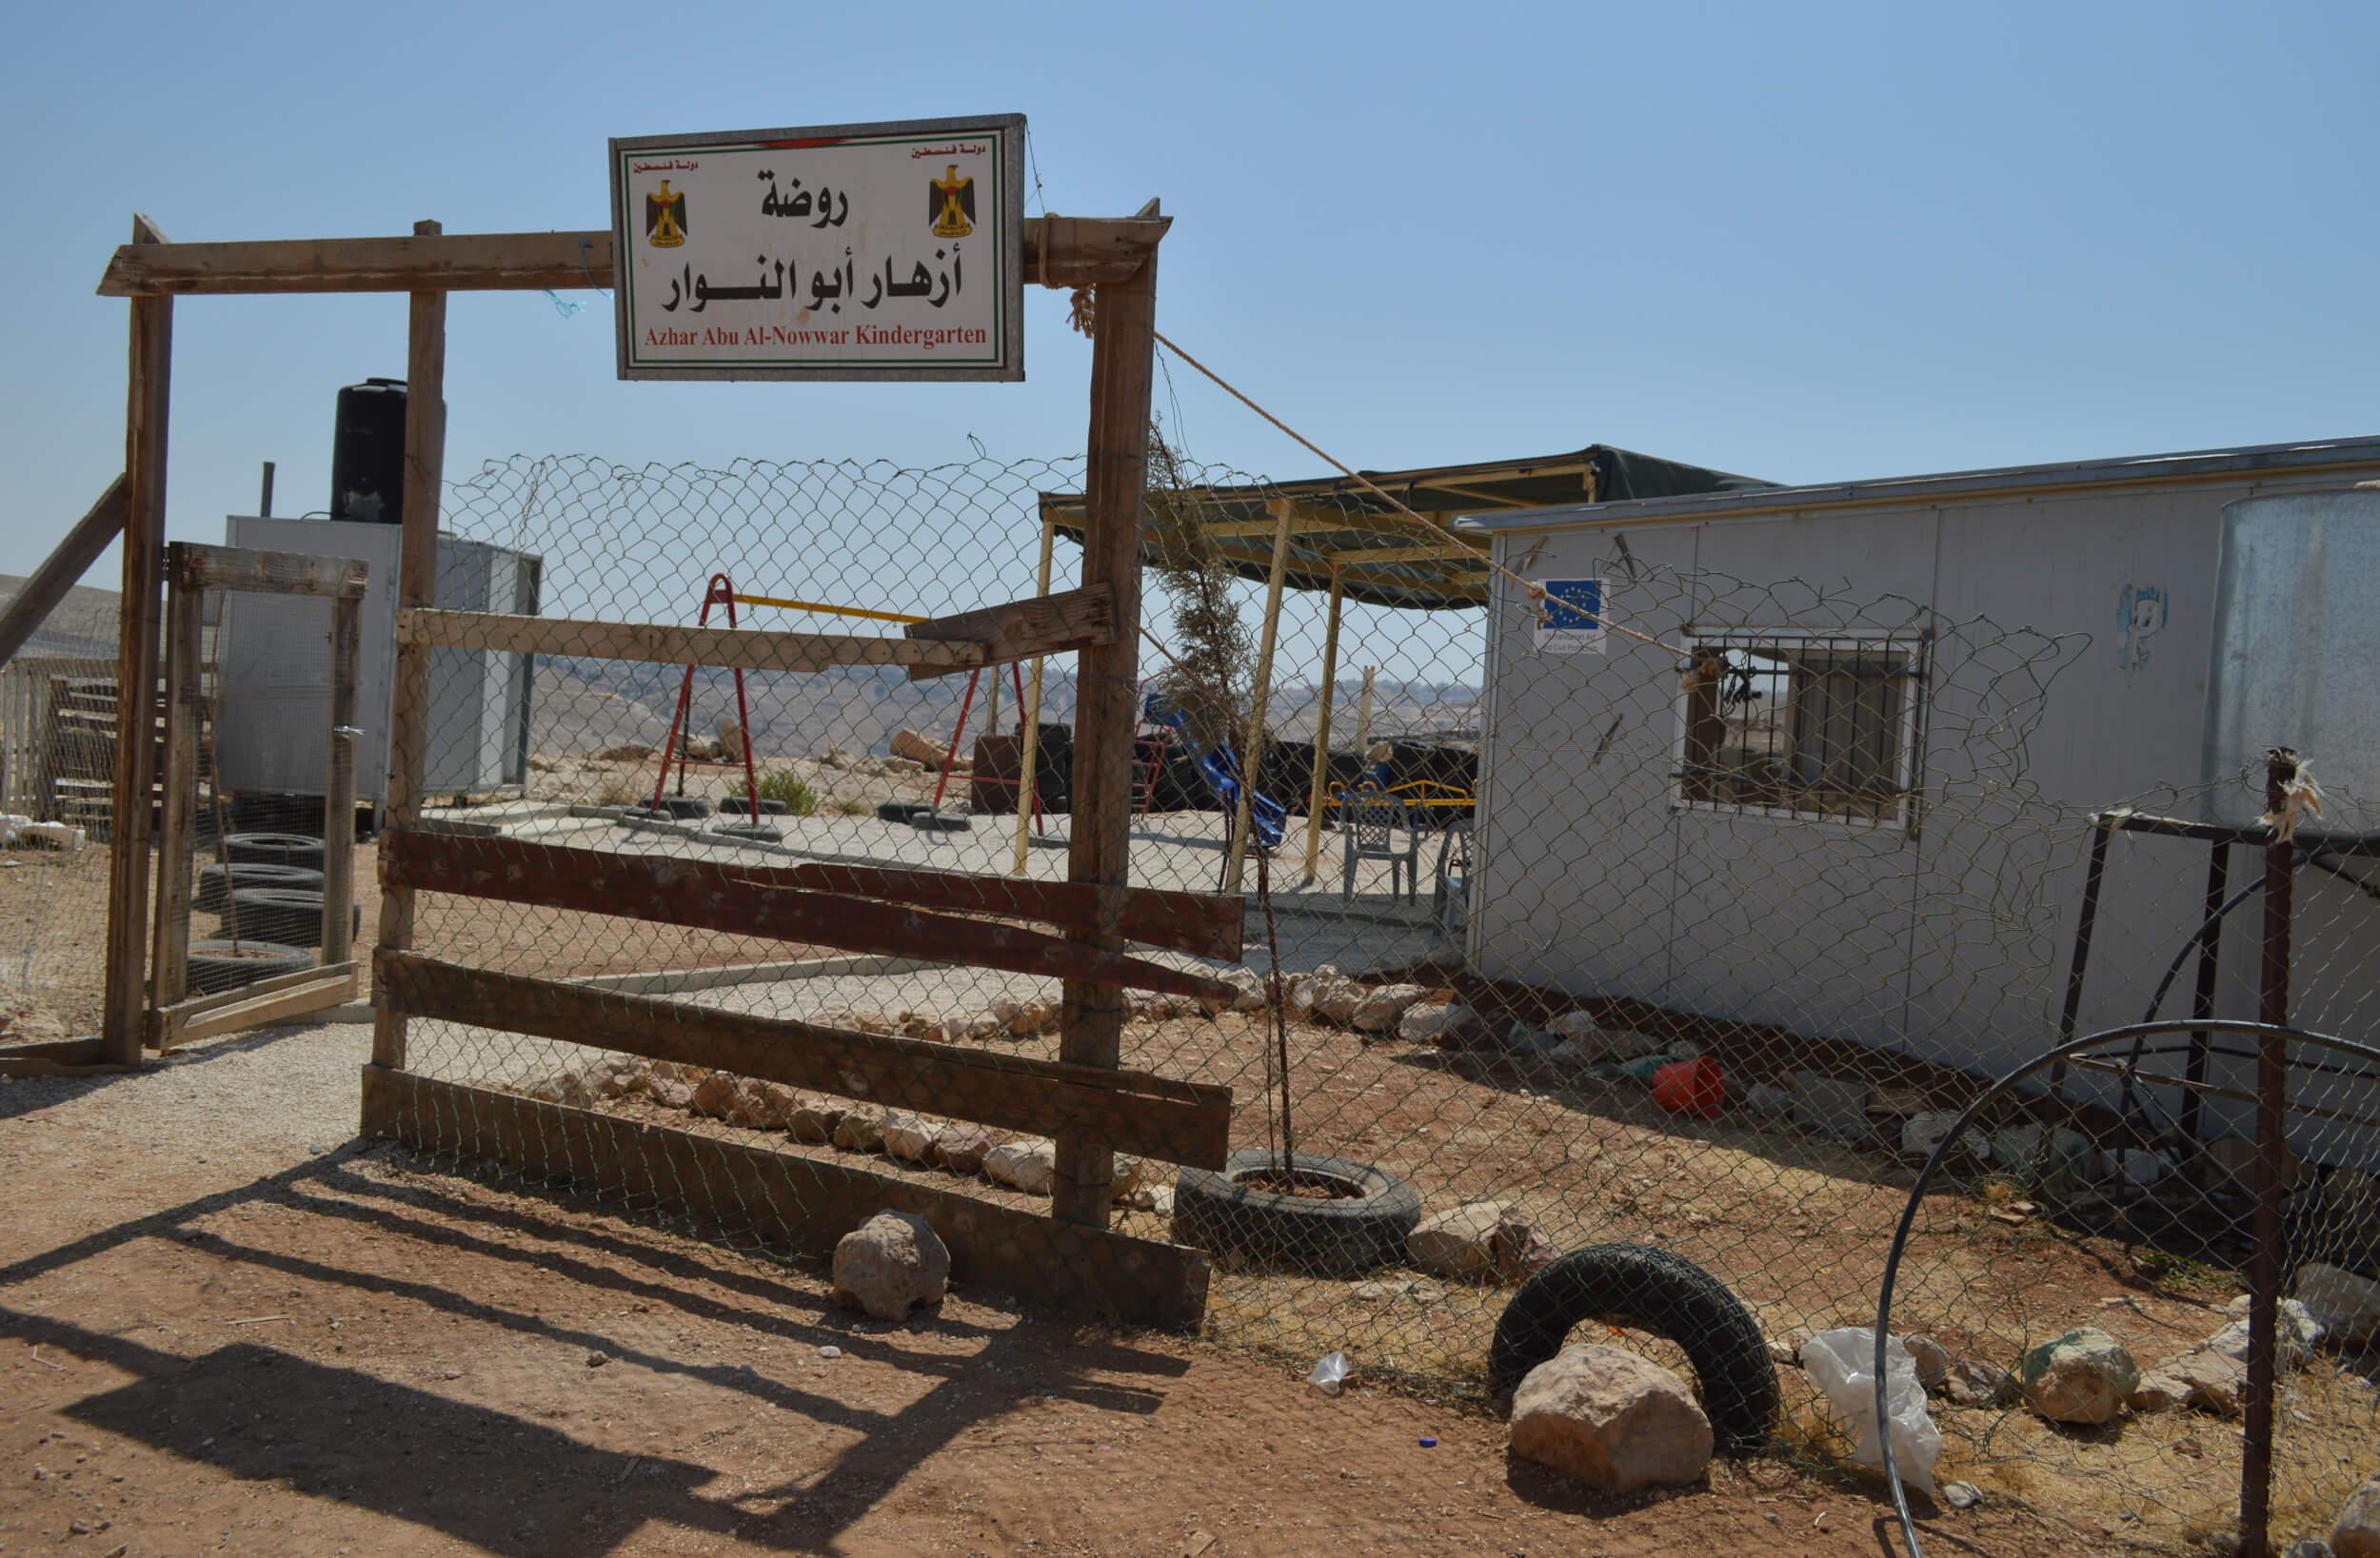 Abu Nuwwar's EU-funded kindergarten is under threat of demolition. (Photo: Lydia Noon)